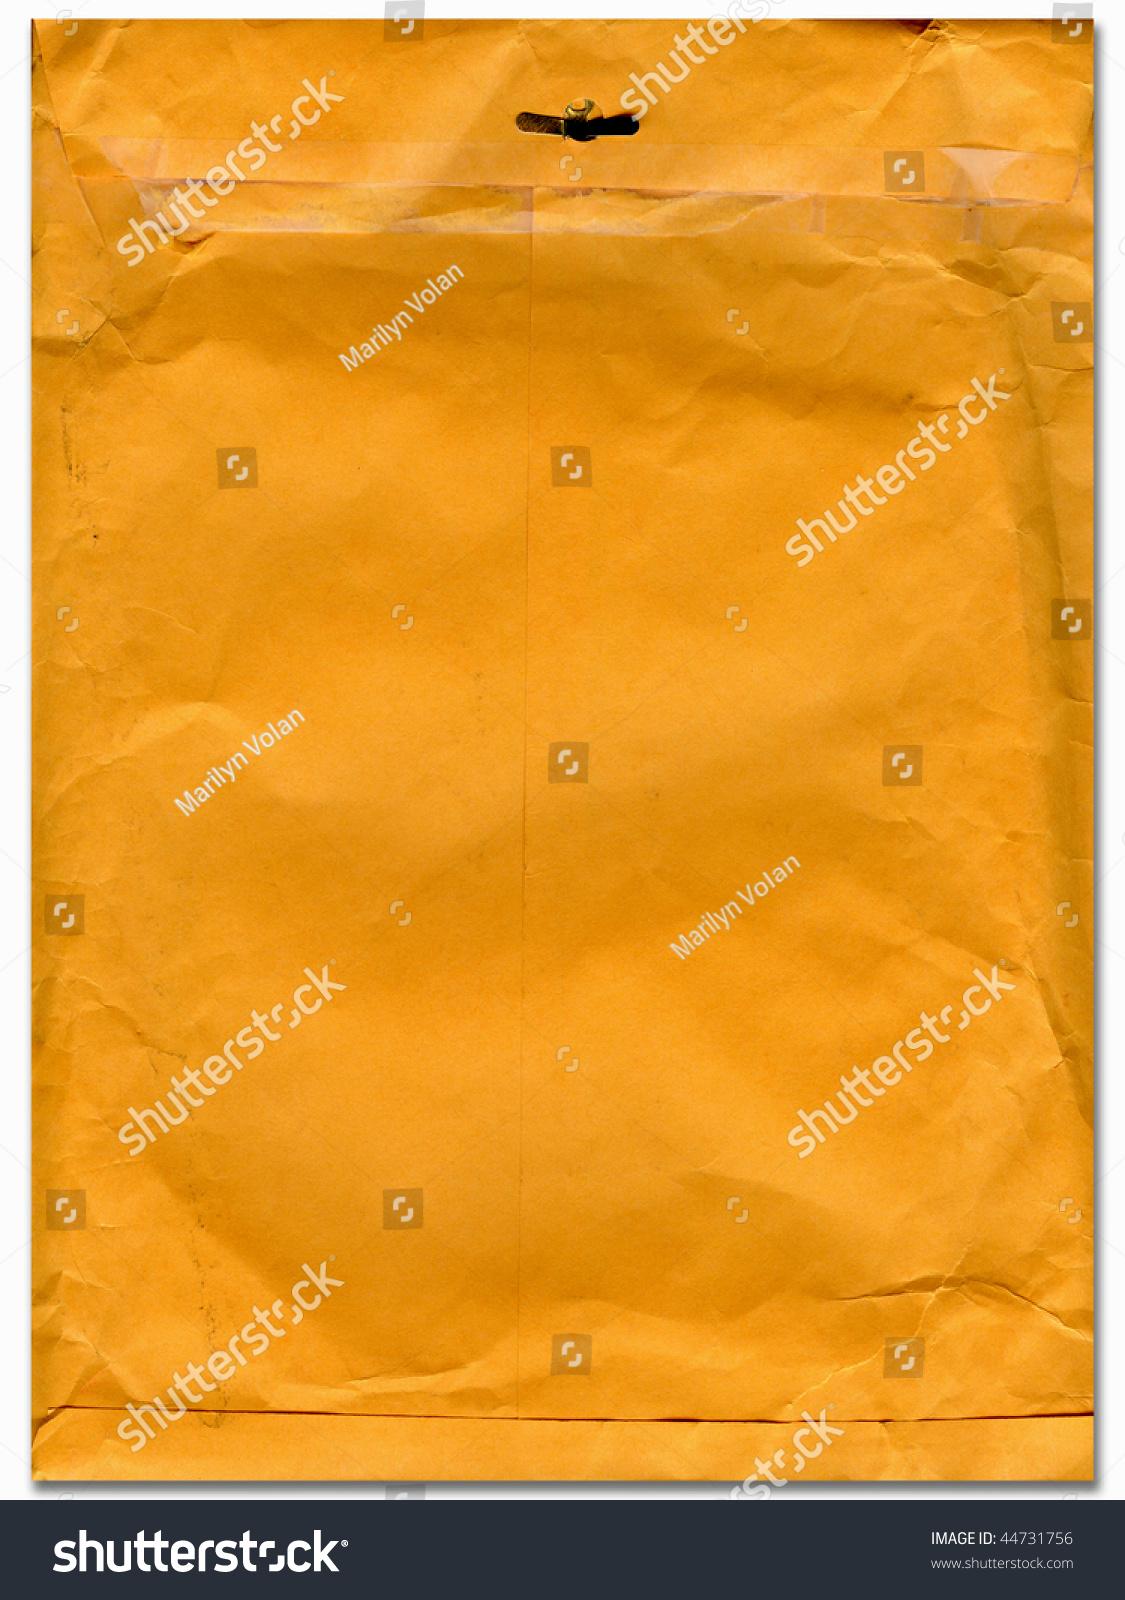 Old Large Manila Envelope Stock Photo 44731756 - Shutterstock